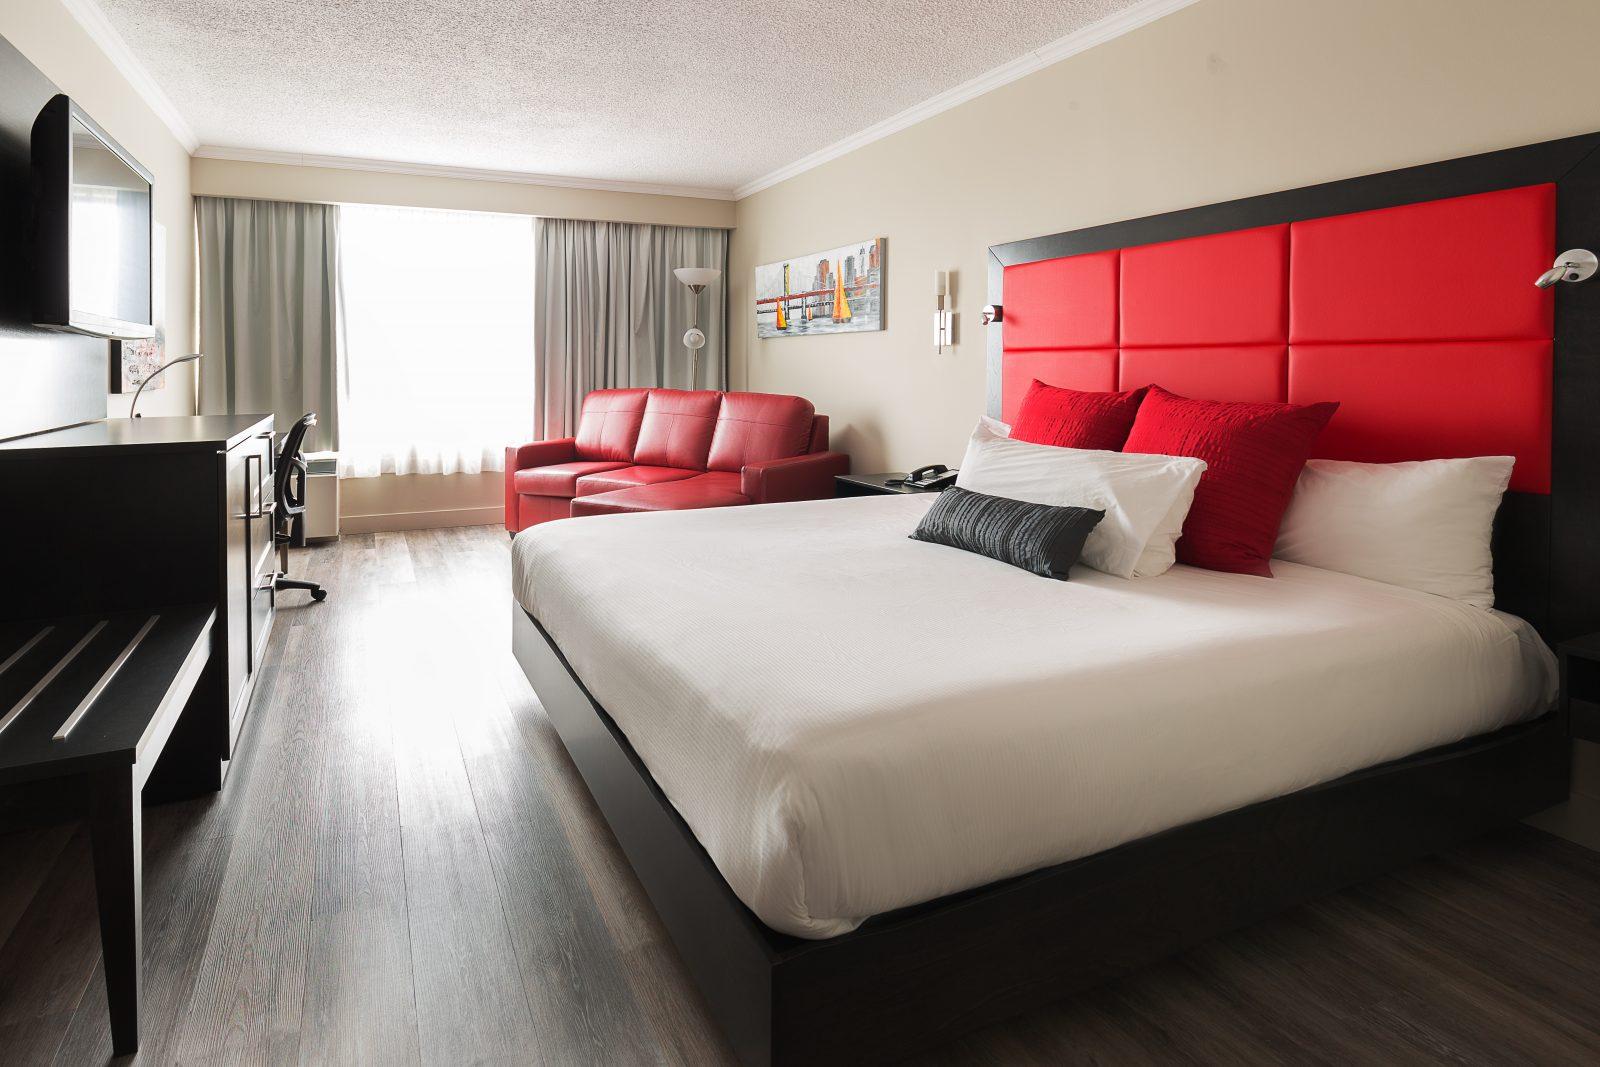 https://www.hoteluniversel.com/wp-content/uploads/2014/09/2Q7A3296-1600x1067.jpg